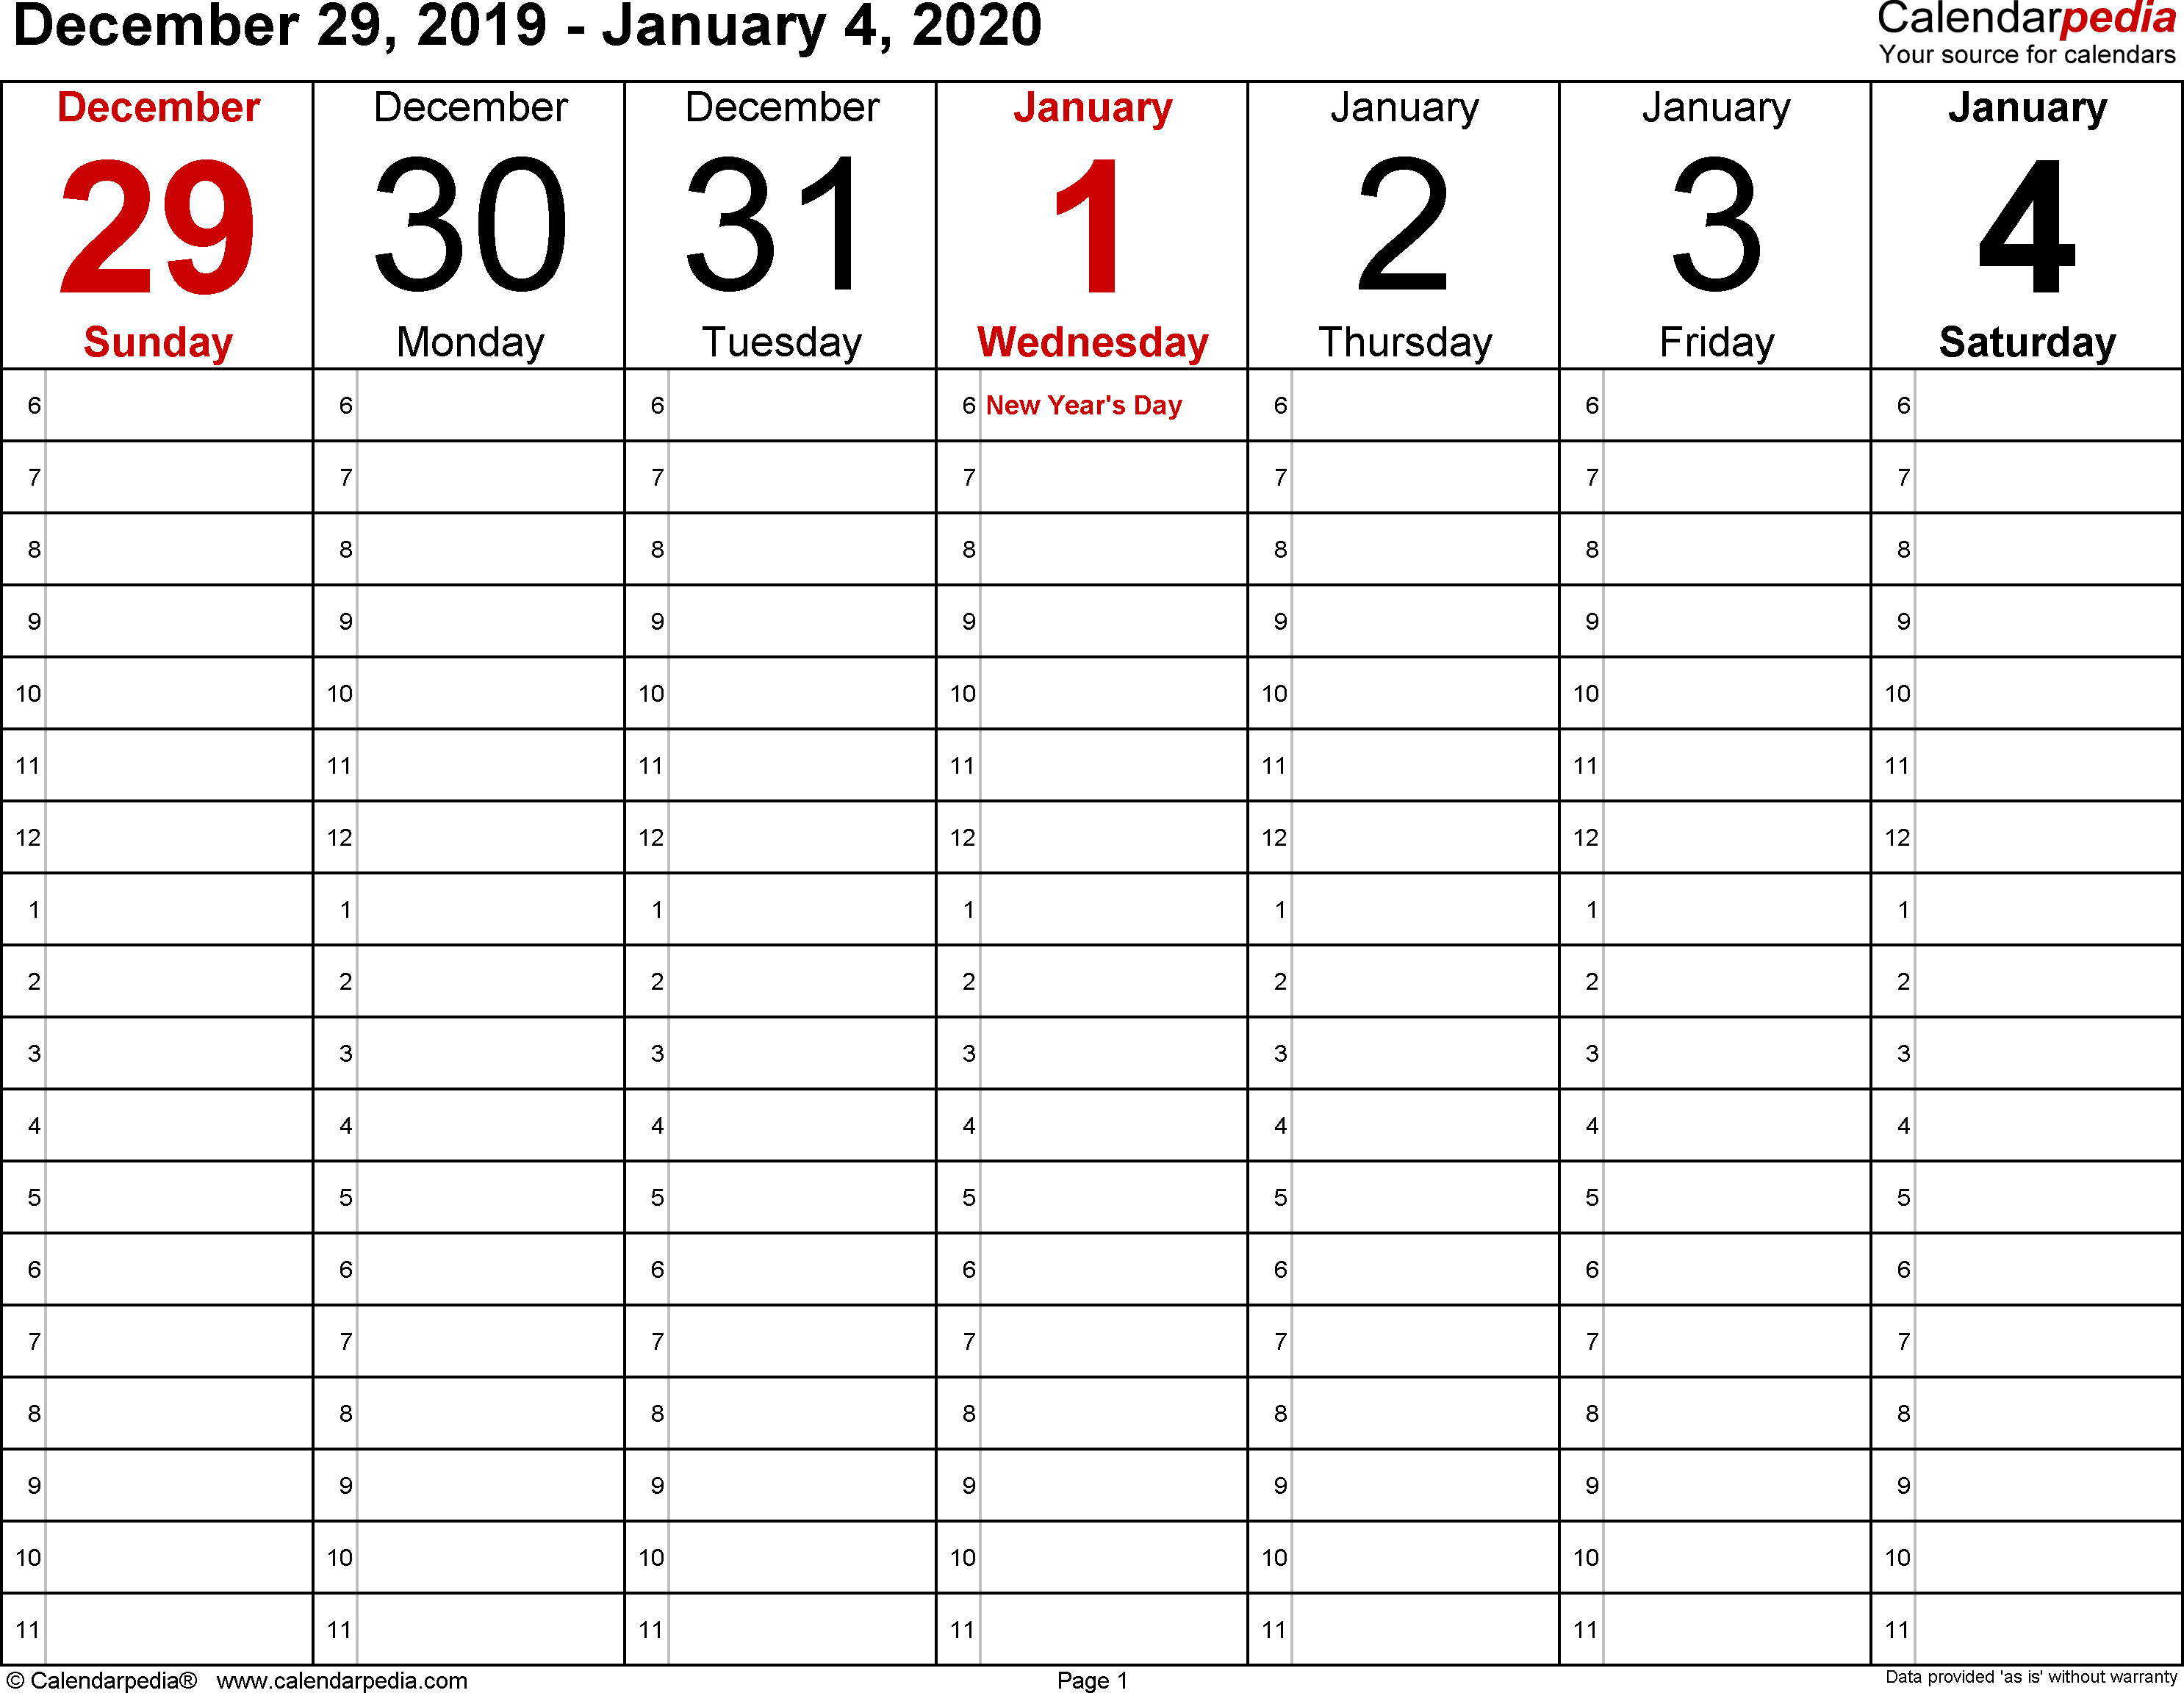 January 2020 Weekly Calendar | Blank January 2020 Calendar